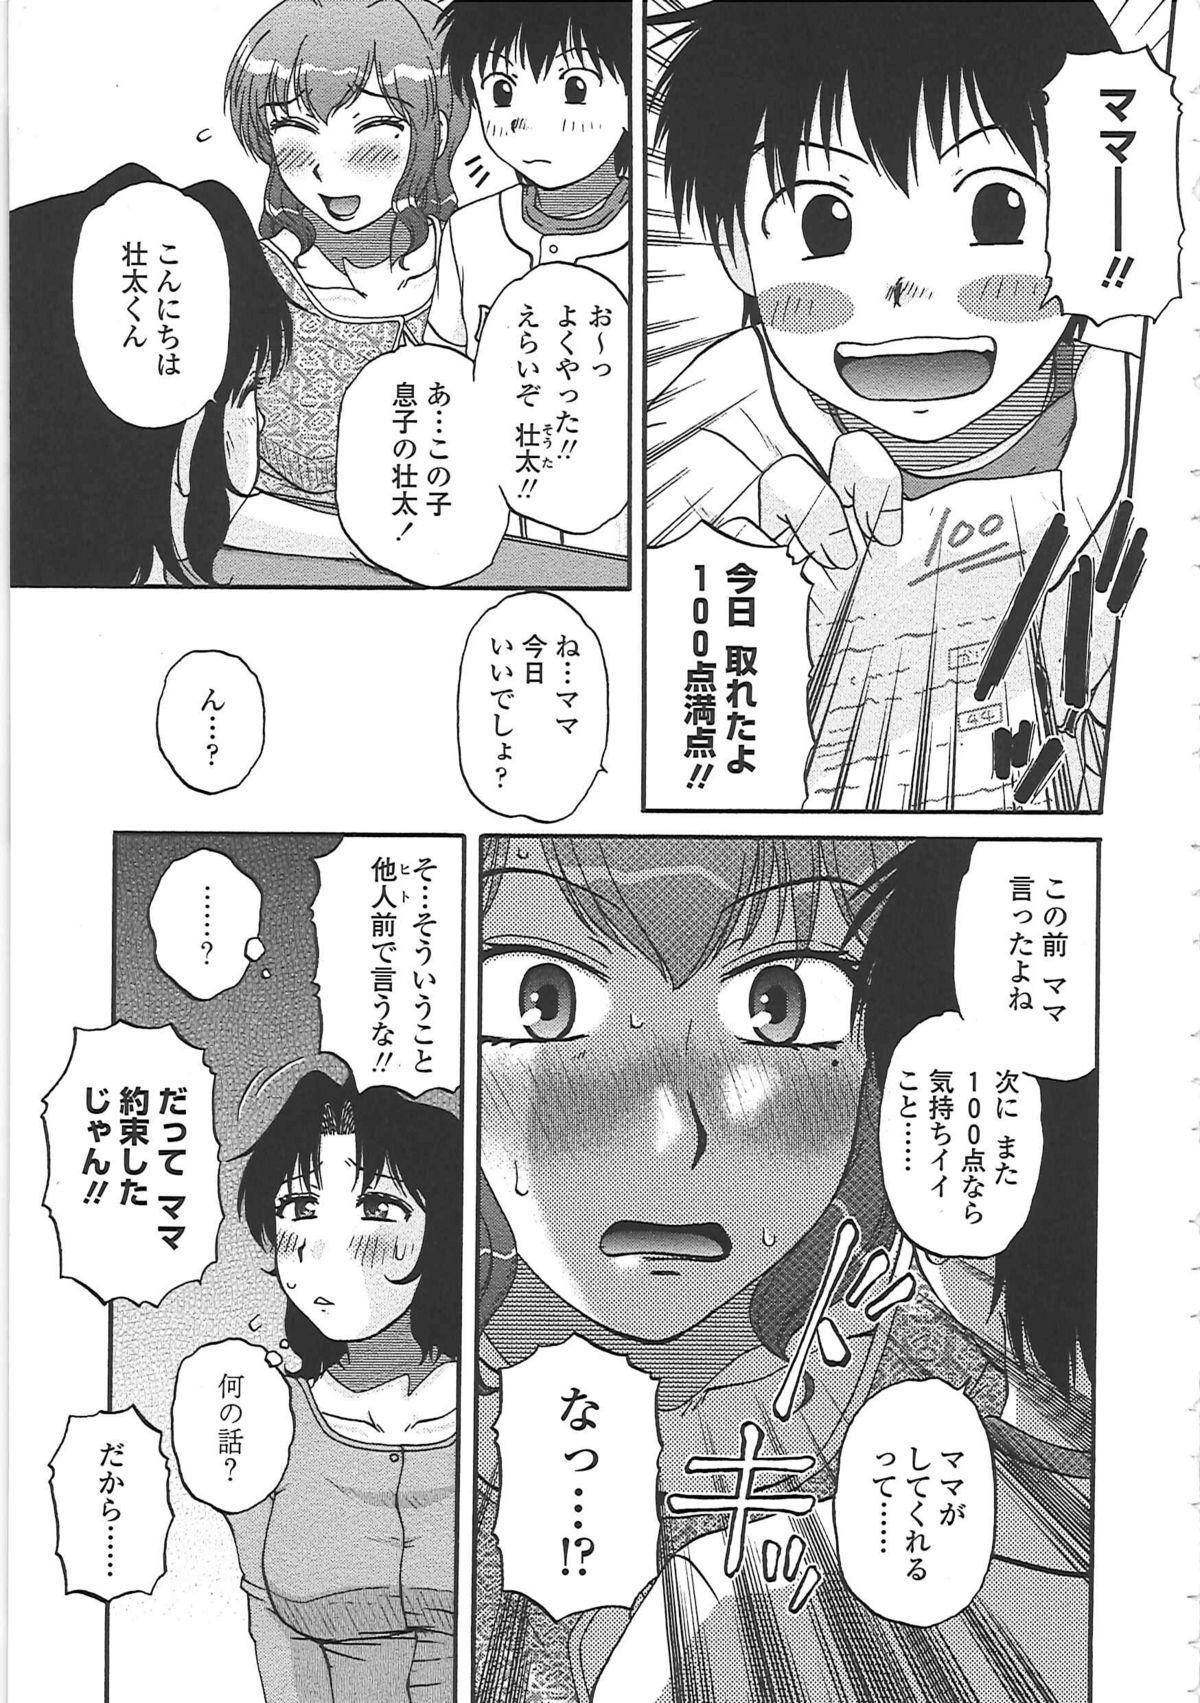 Nikuzuma Tsuushin - Erotic Wife Communication 29